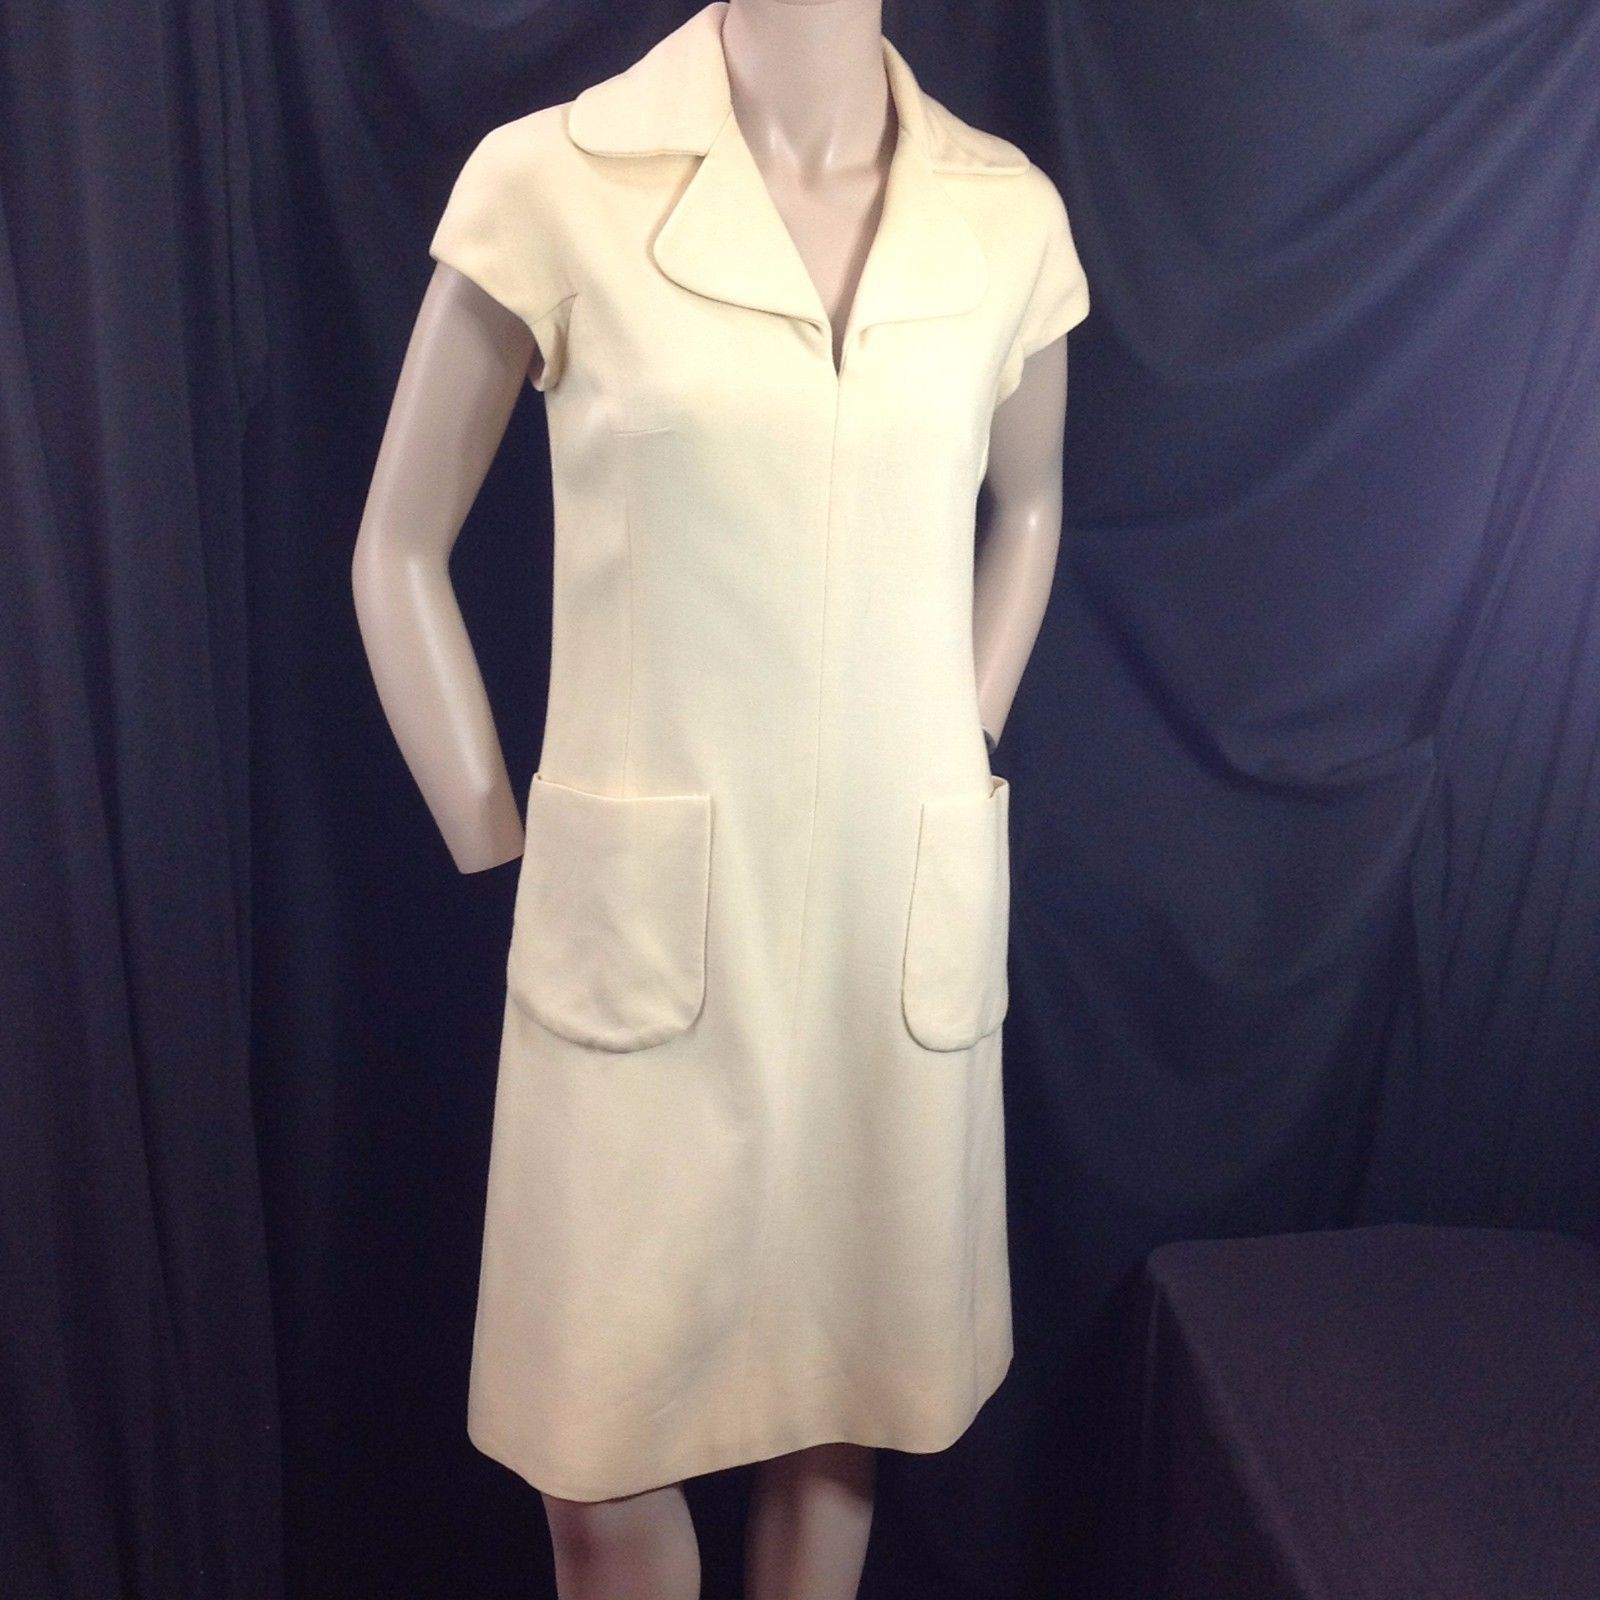 Vtg Ivory Wool Mod Sheath Dress Shannon Rodgers Jerry Silverman ILGWU M